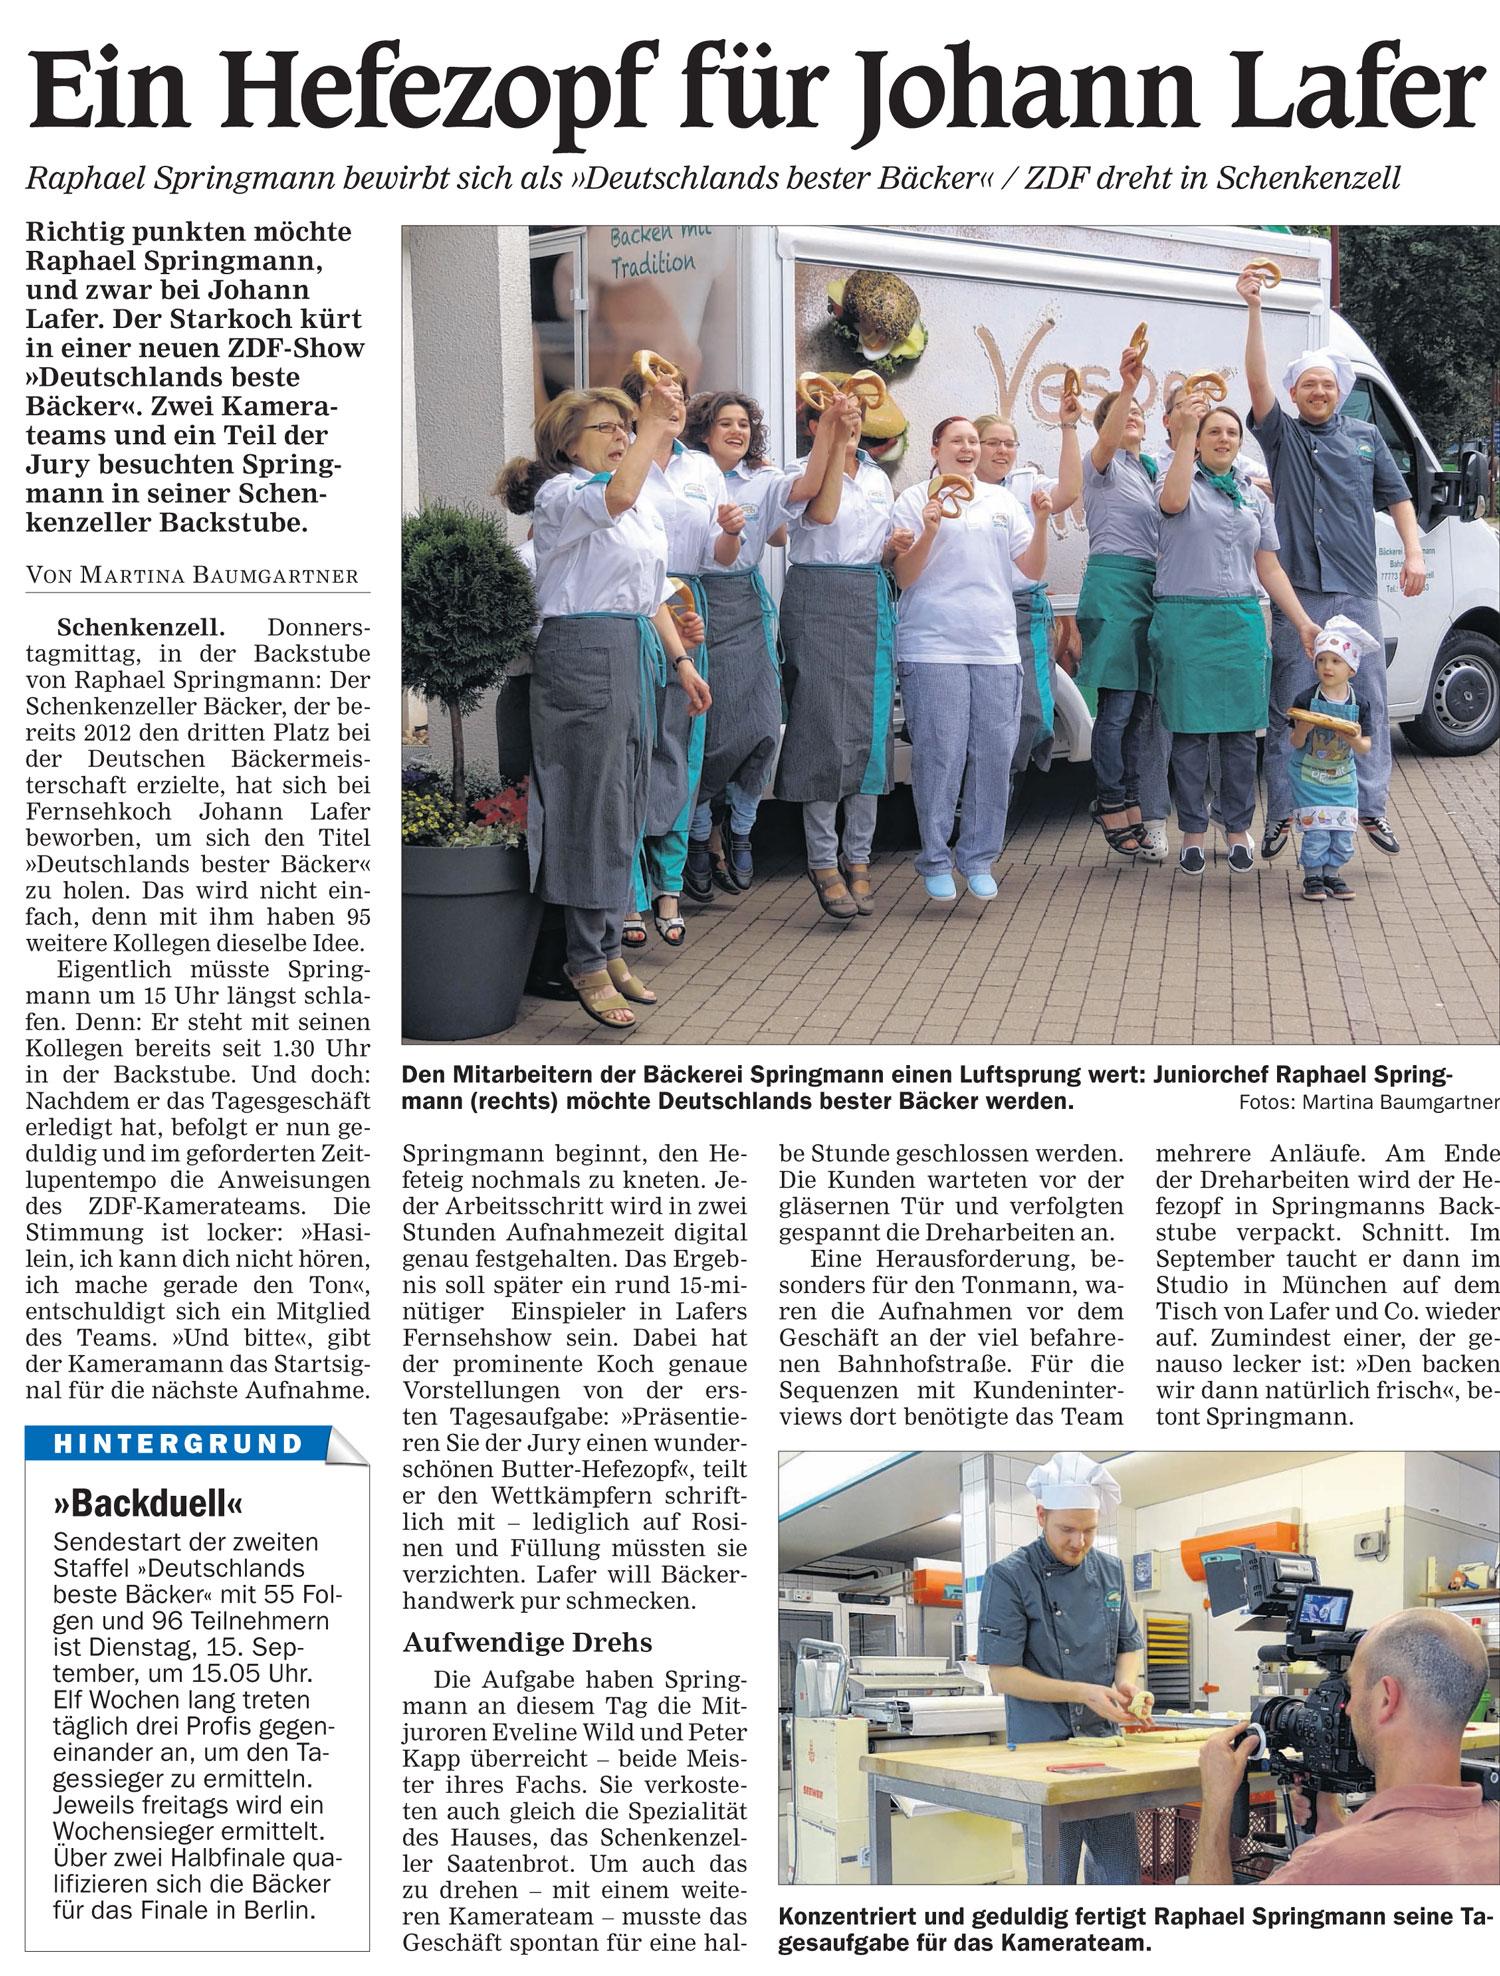 bester bäcker deutschlands